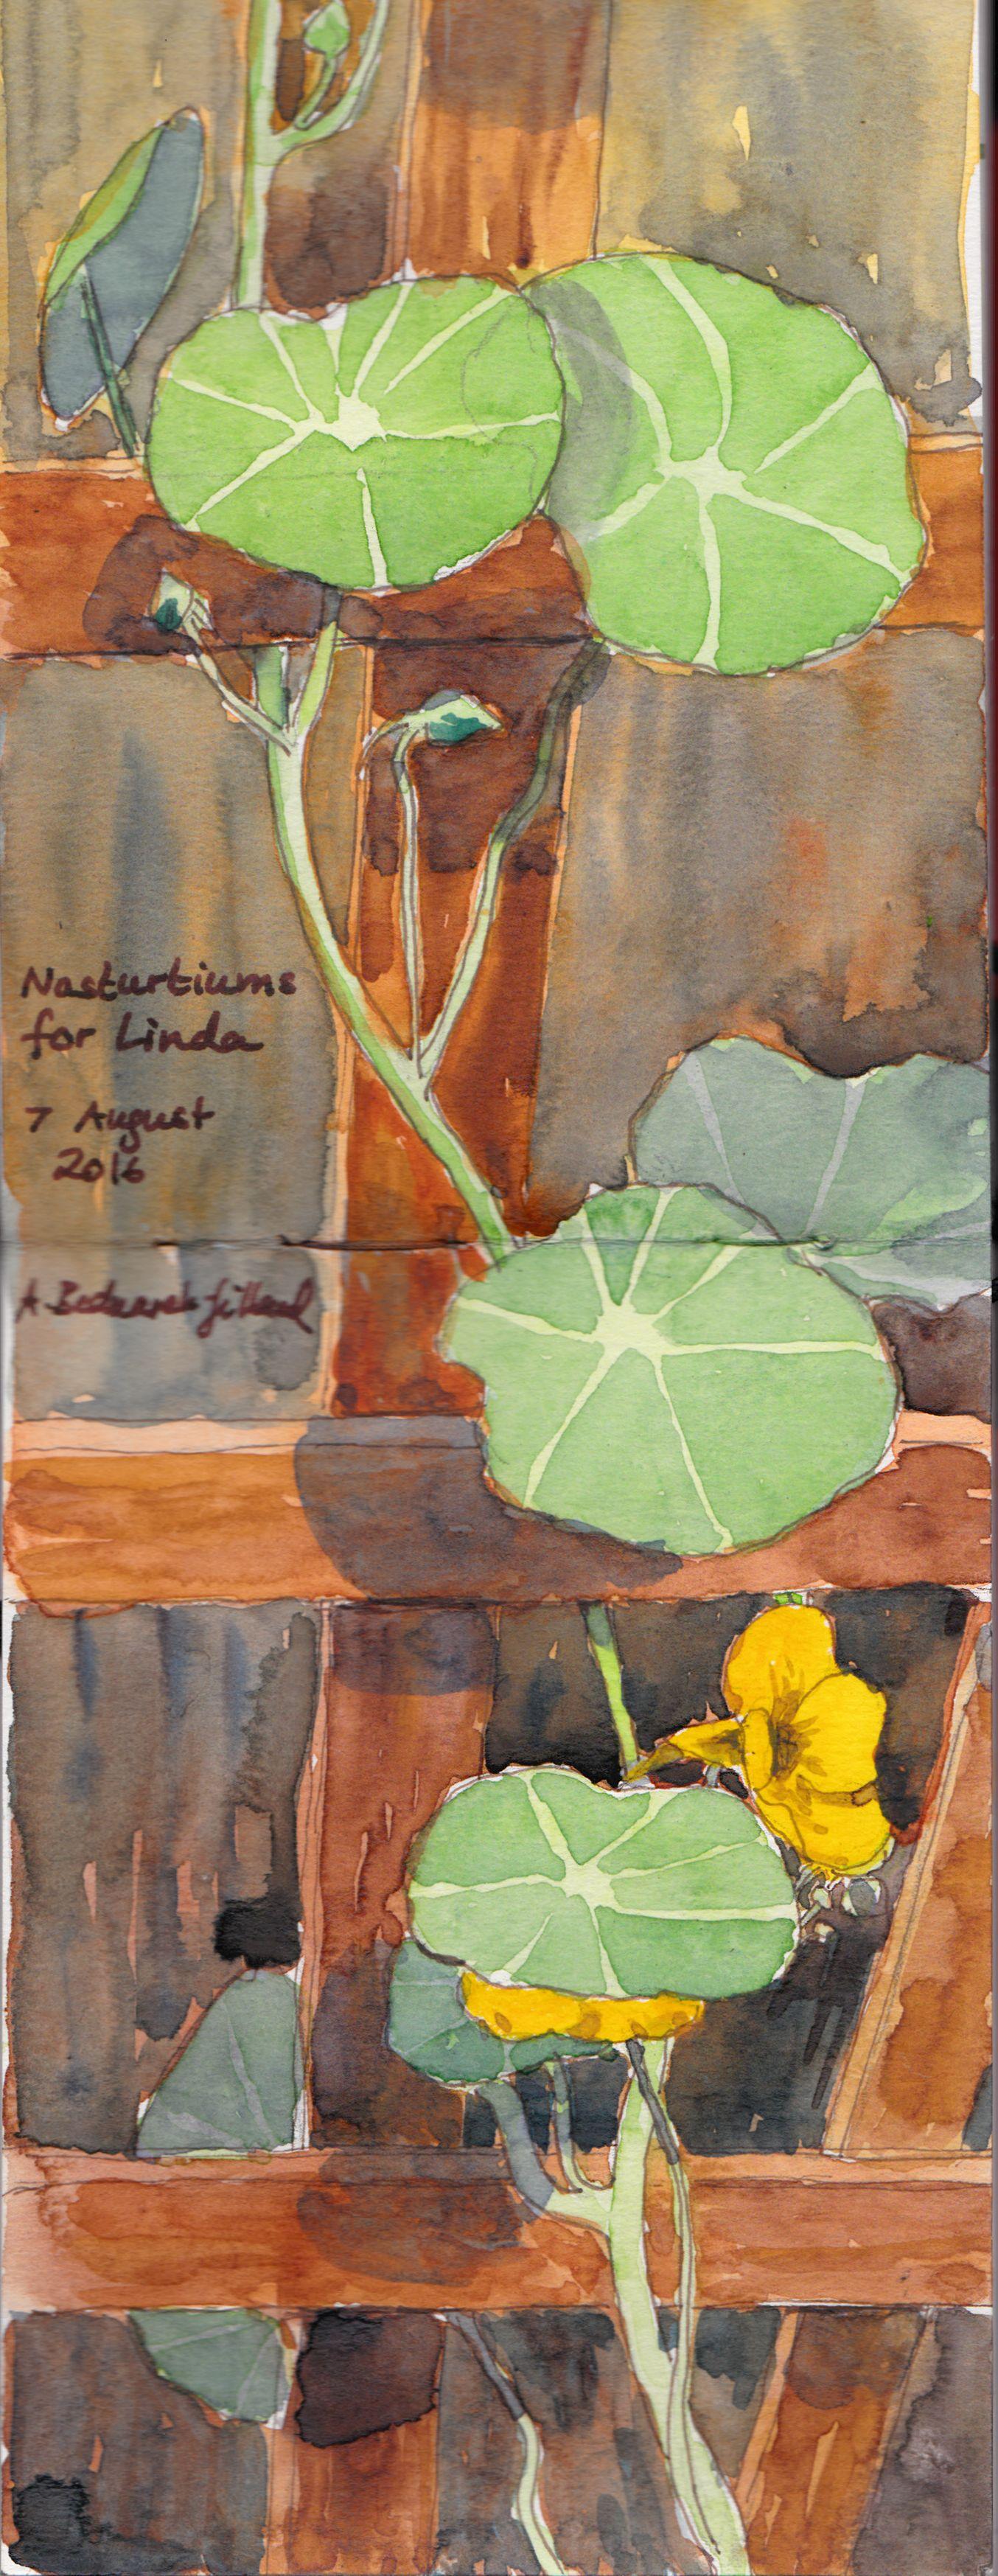 This year's nasturtiums| Kapuzinerkresse 2016